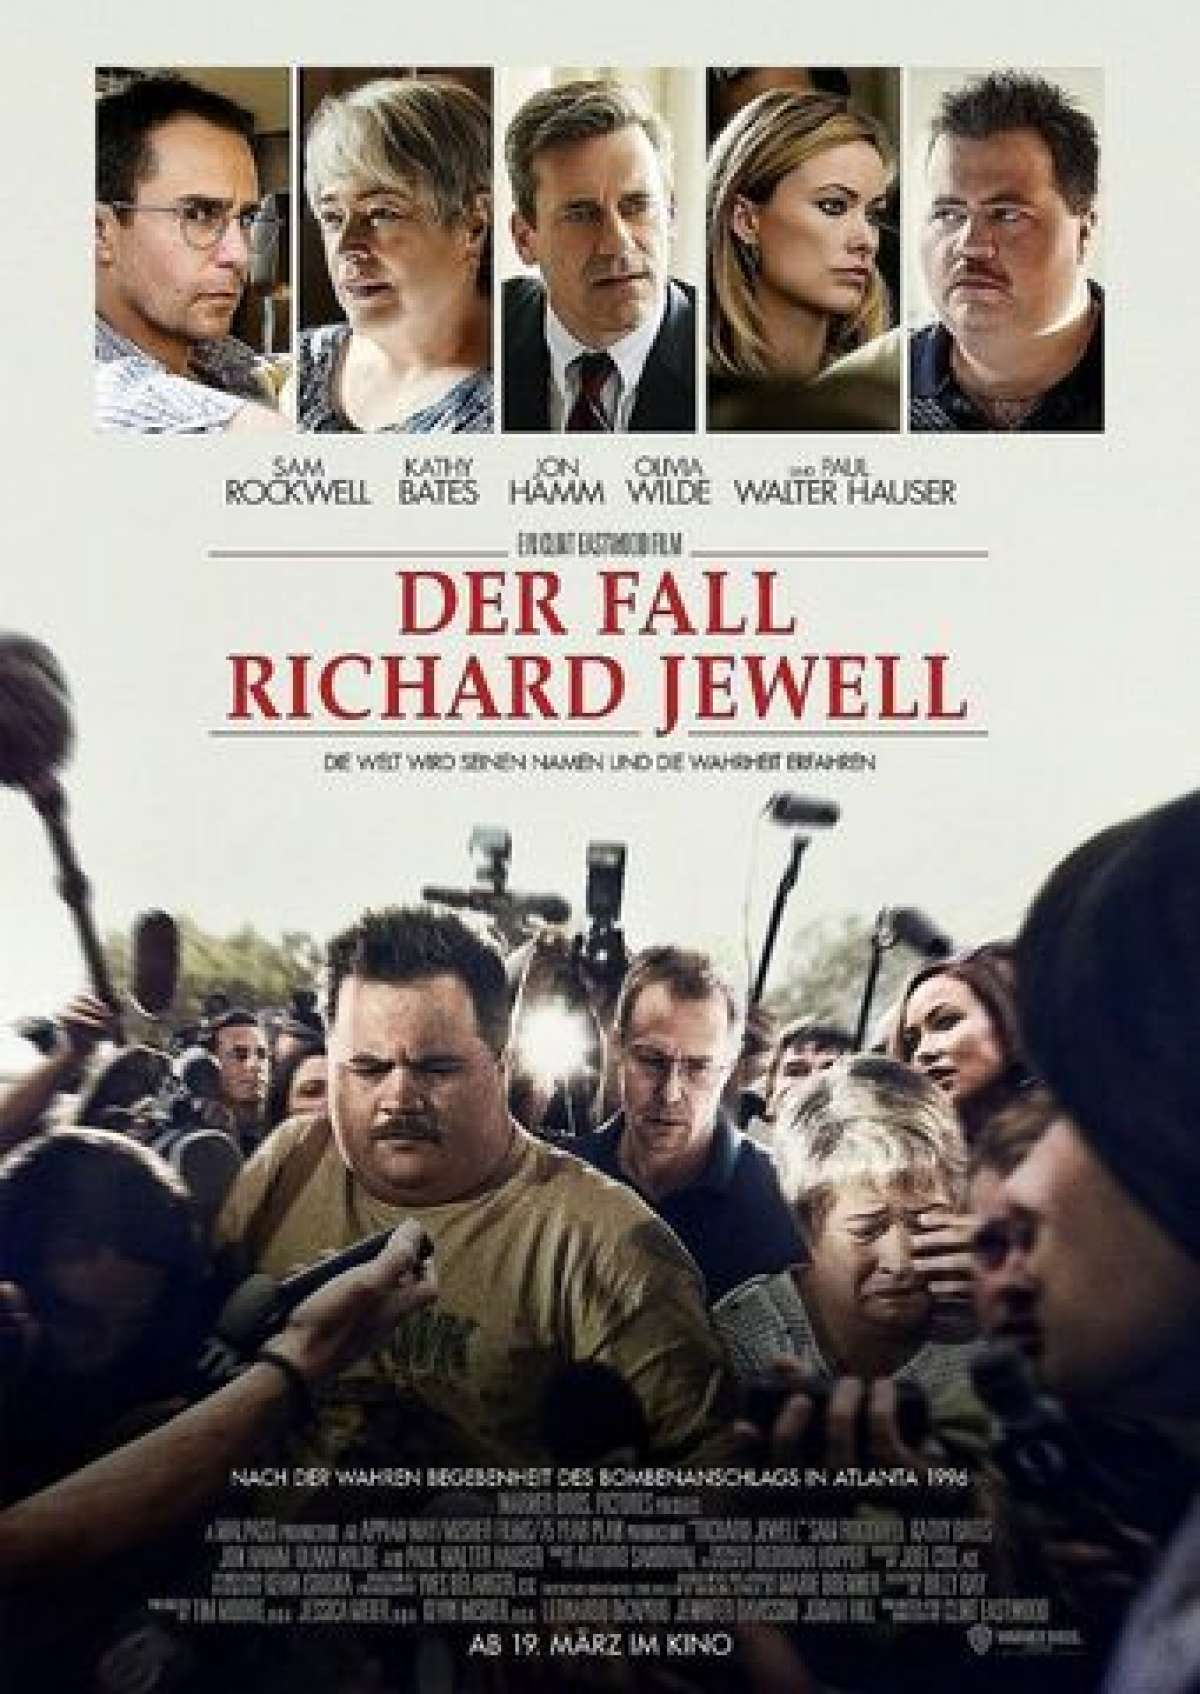 Der Fall Richard Jewell - Cine-Royal  - Fritzlar